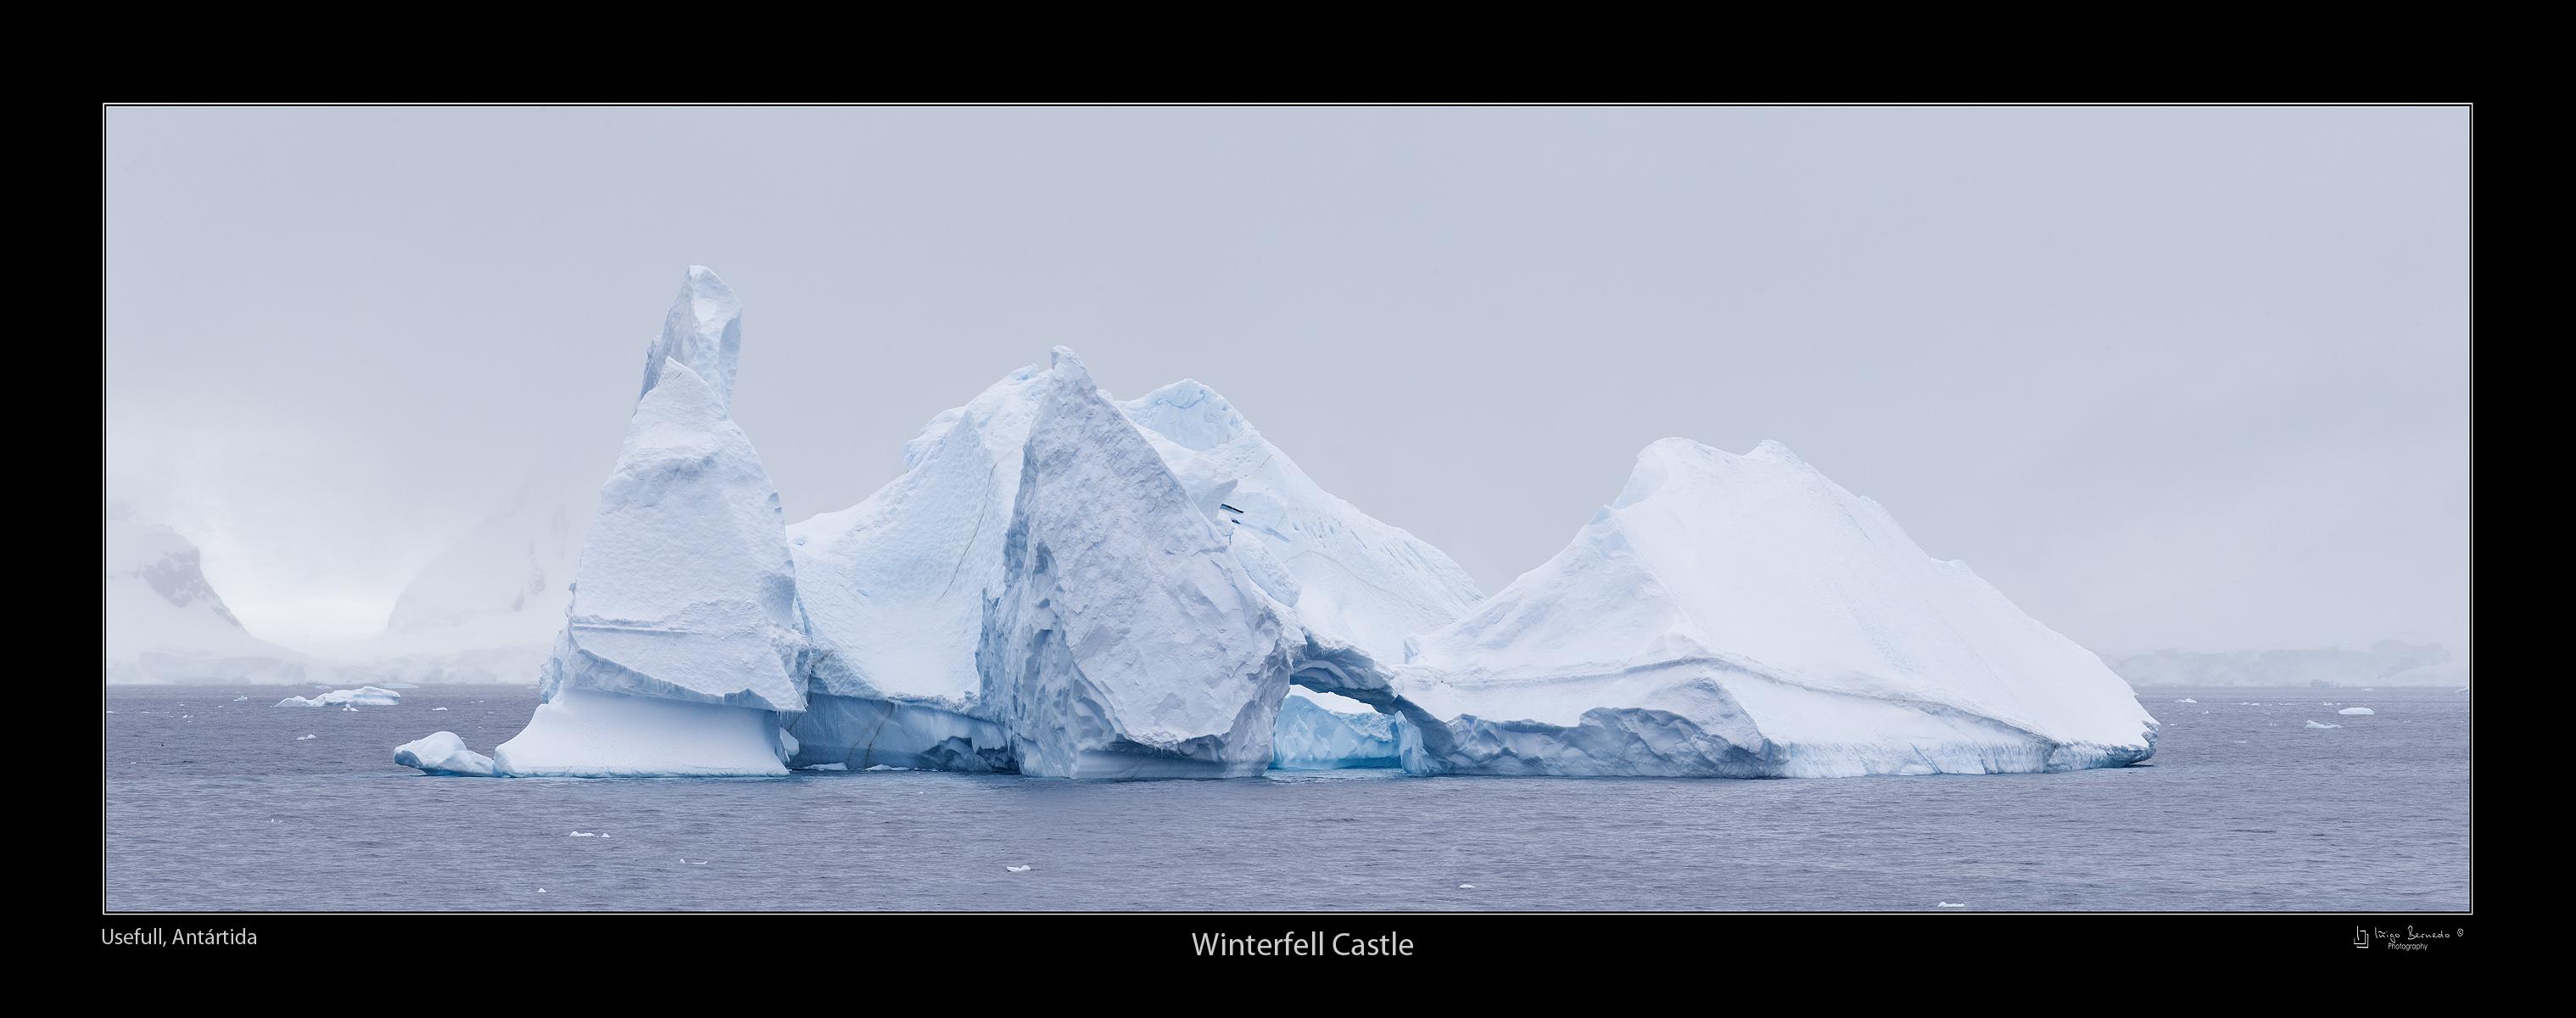 Usefull, Castillo de Hielo - Antártida - Iñigo Bernedo, Fotografía